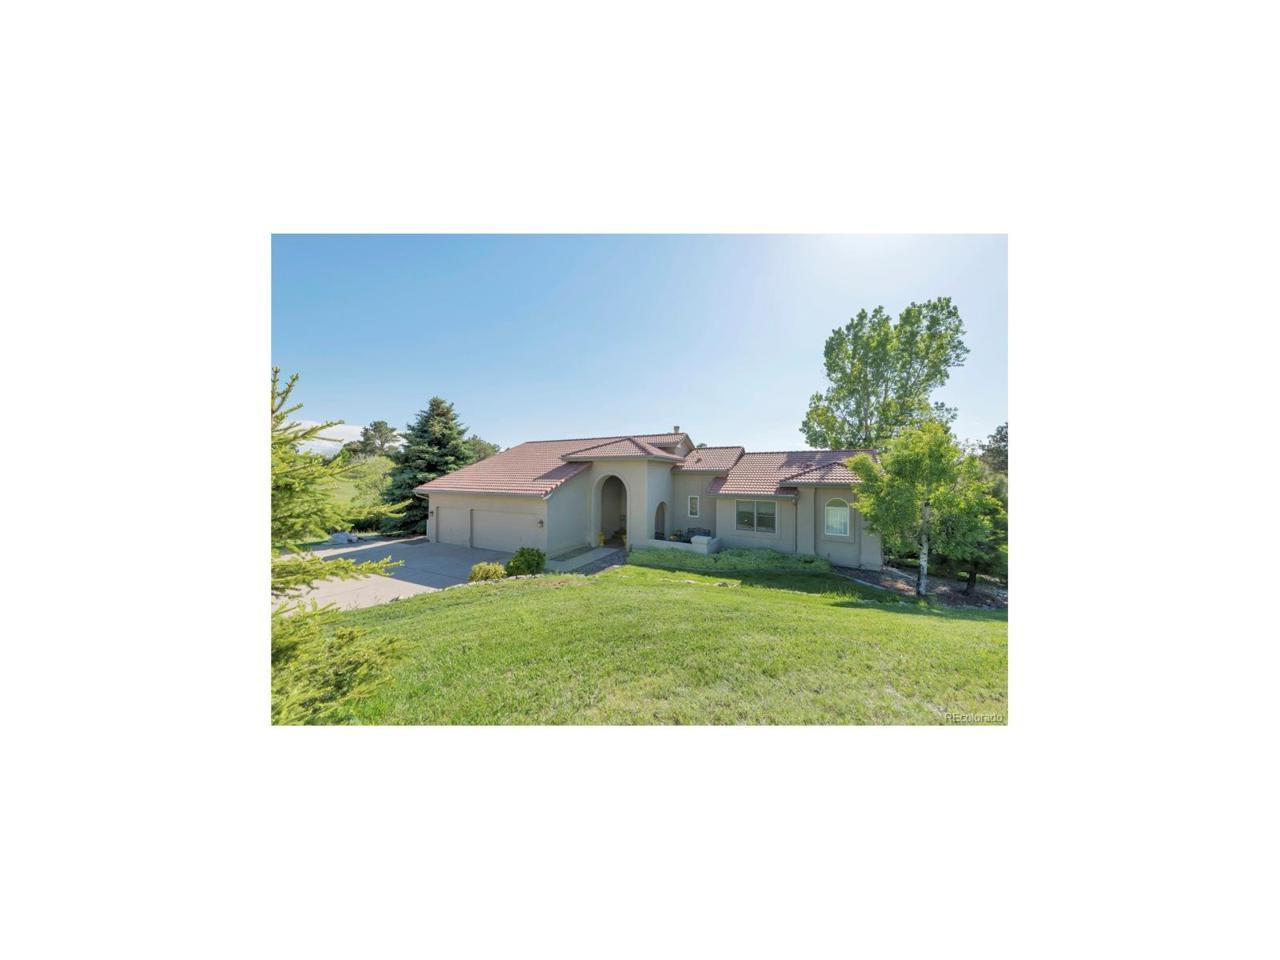 8153 S Old Hammer Lane, Aurora, CO 80016 (MLS #4950912) :: 8z Real Estate